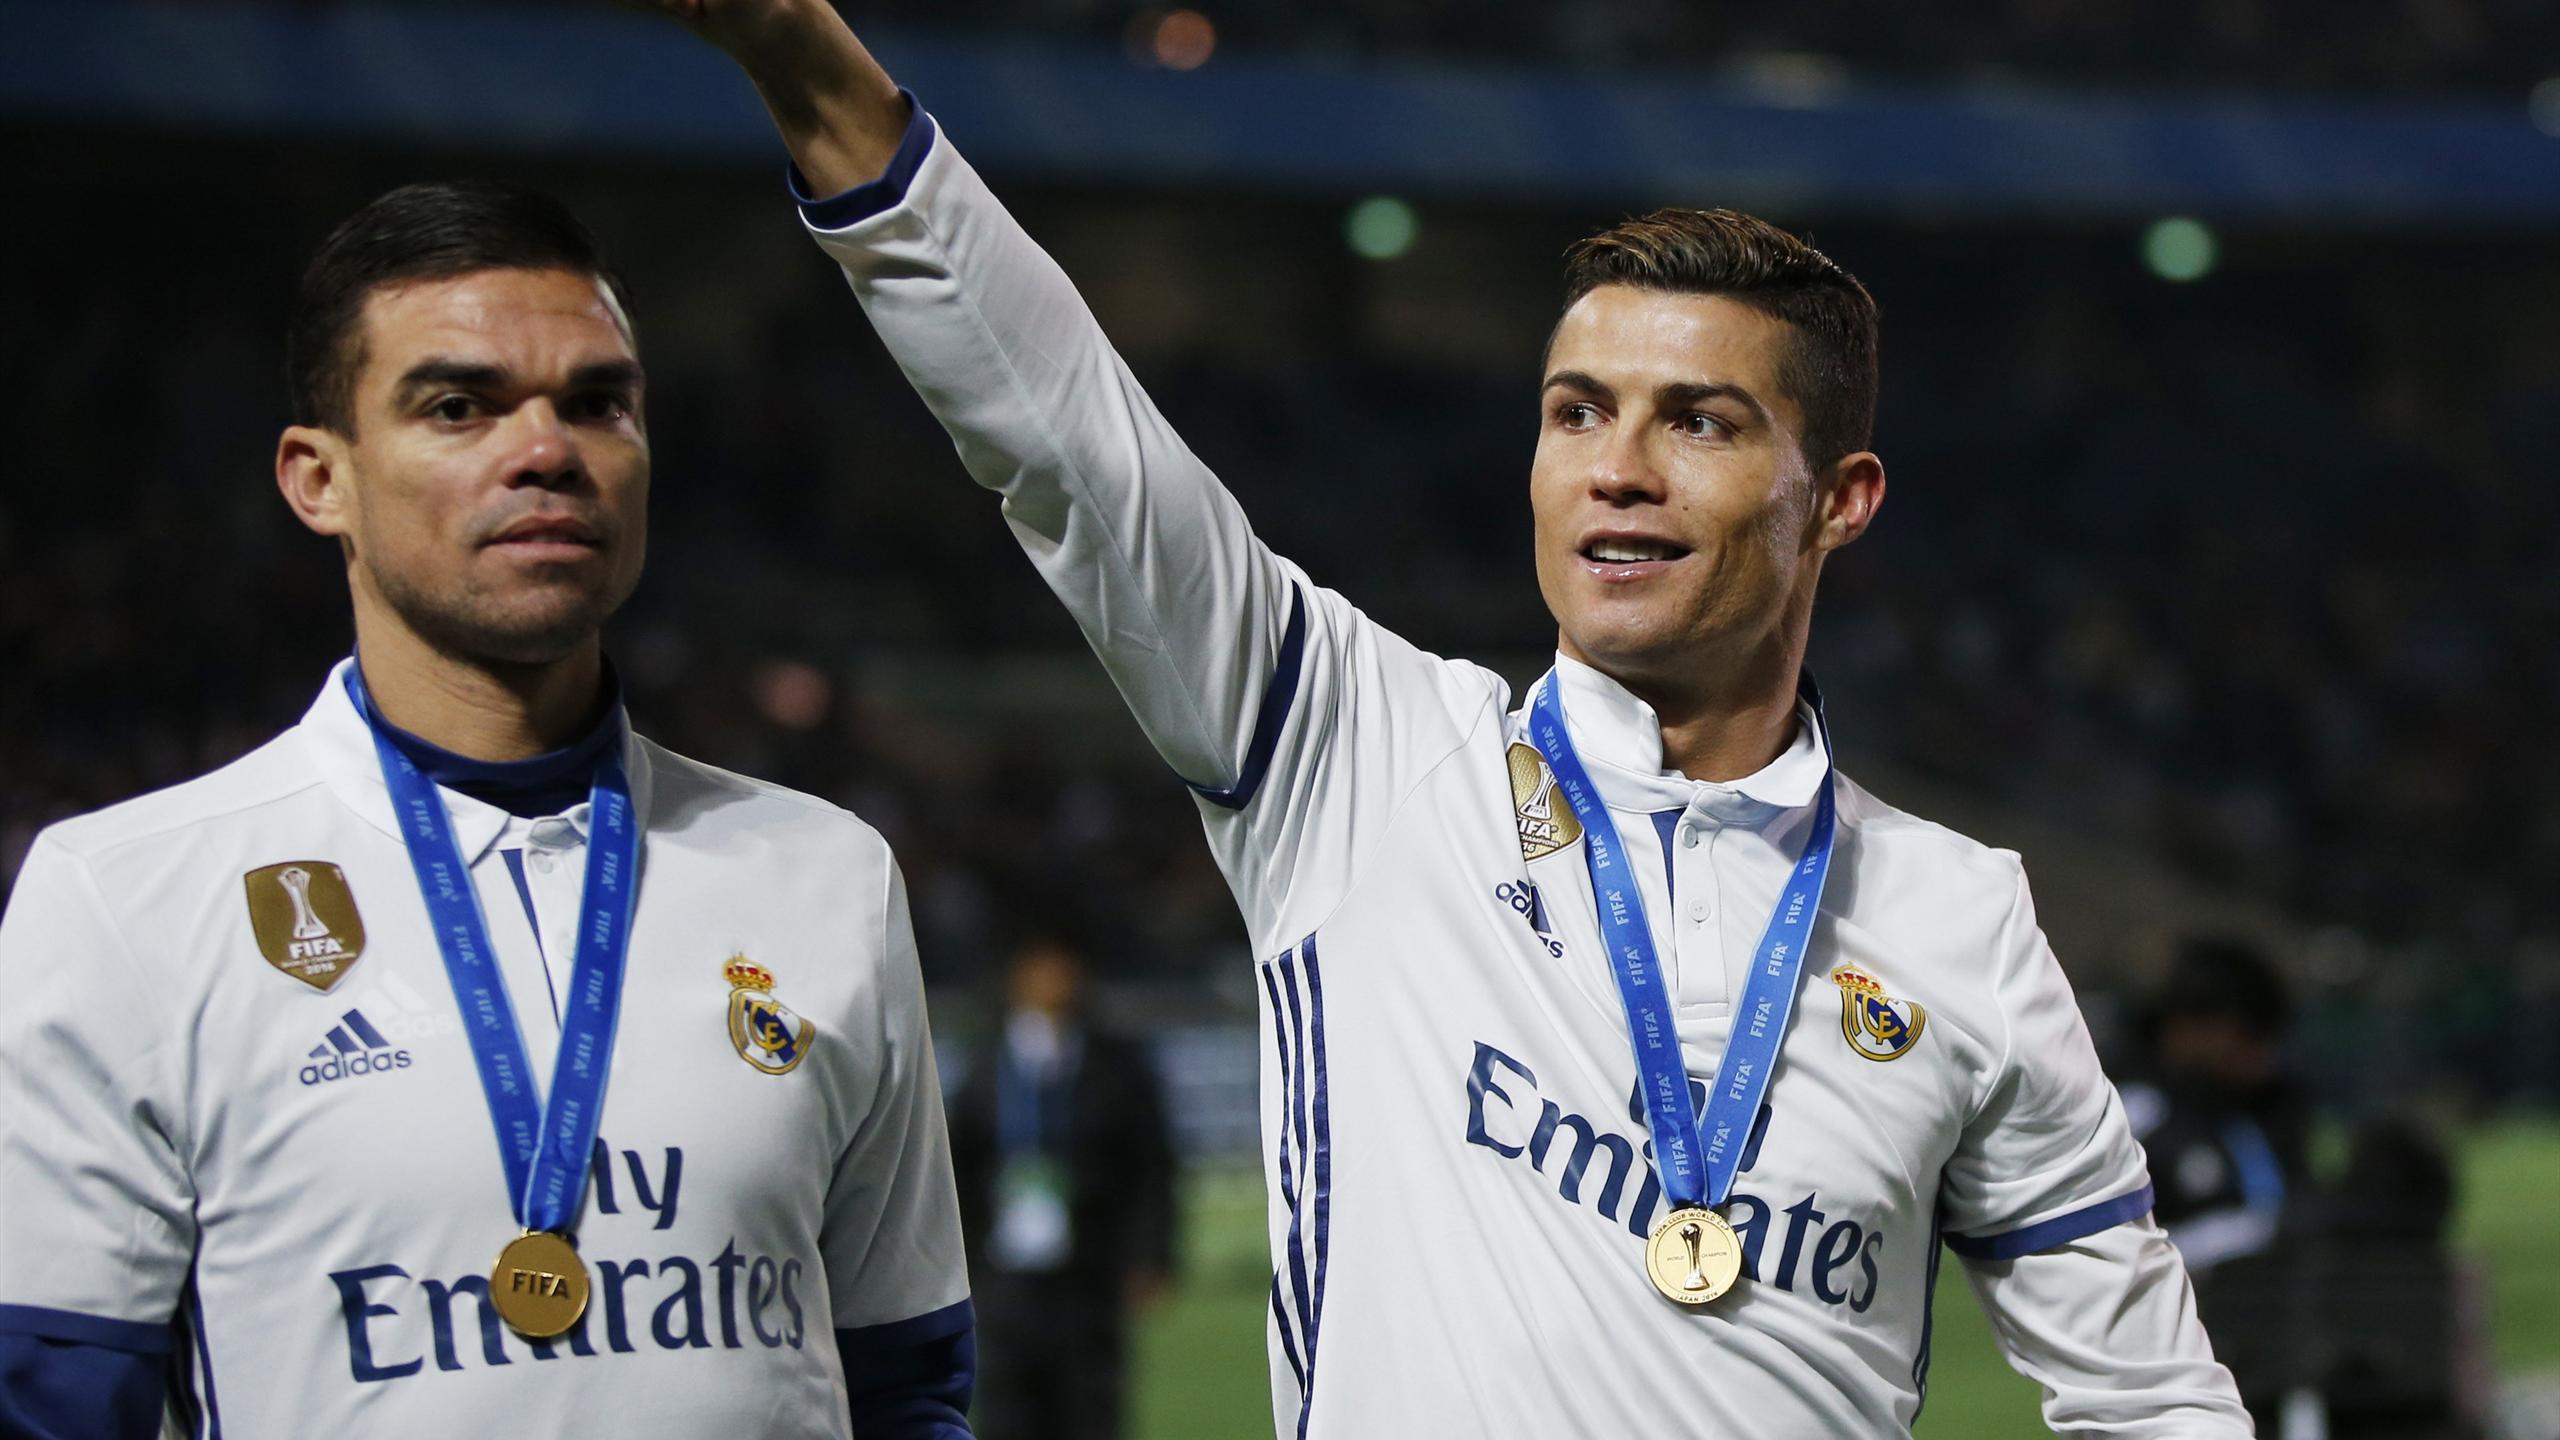 Cristiano Ronaldo celebrates Club World Cup win with Real Madrid team-mate Pepe